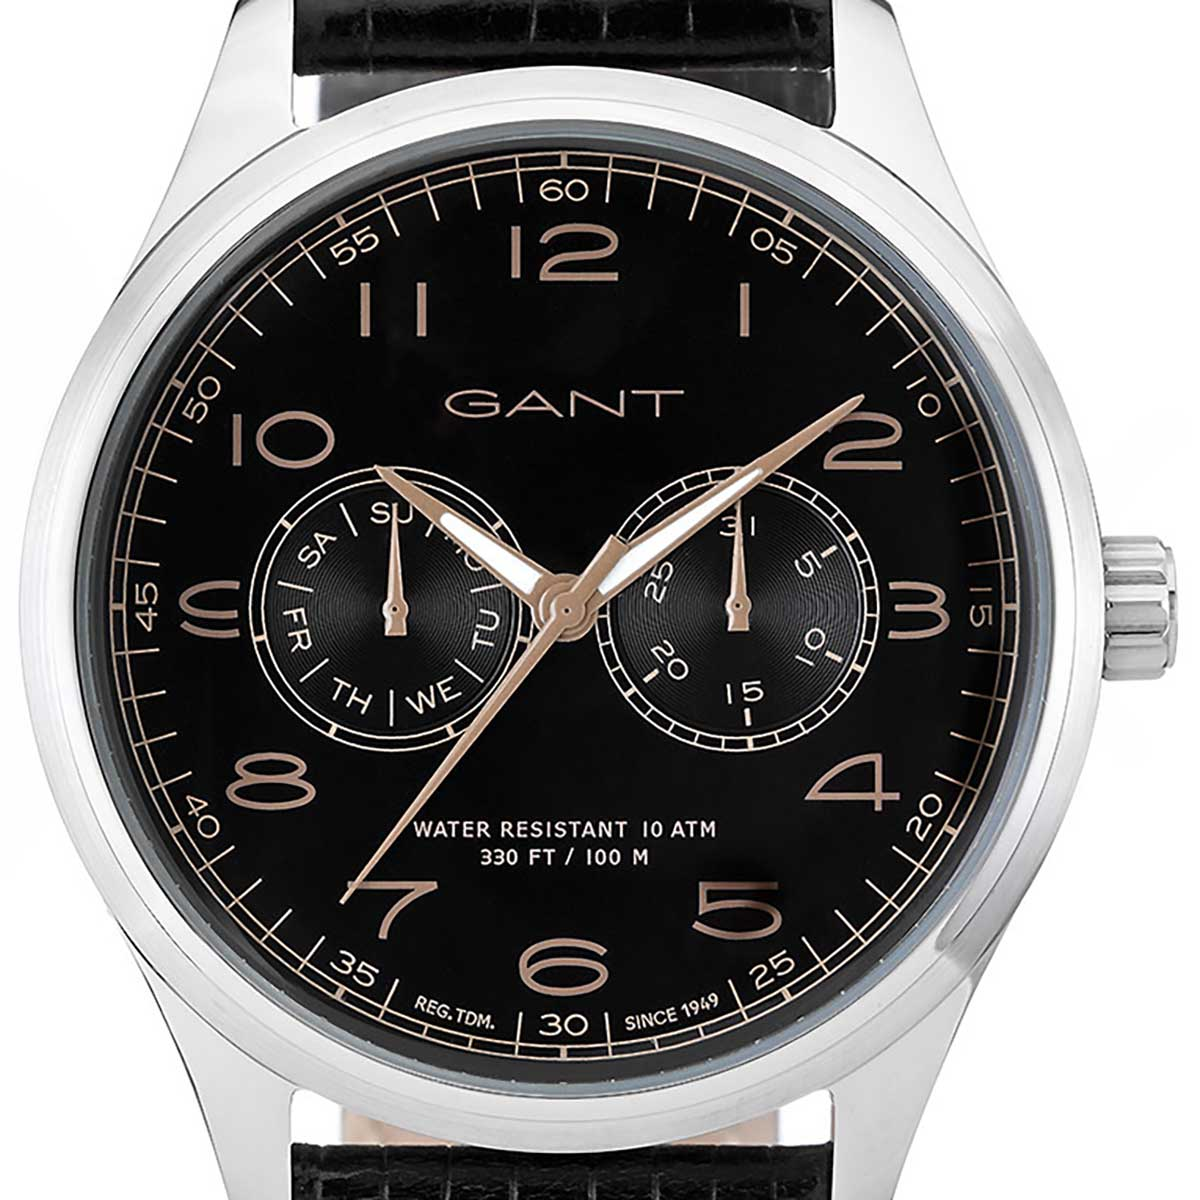 GANT ガント 電池式クォーツ 腕時計 [W71601] 並行輸入品 デイデイト